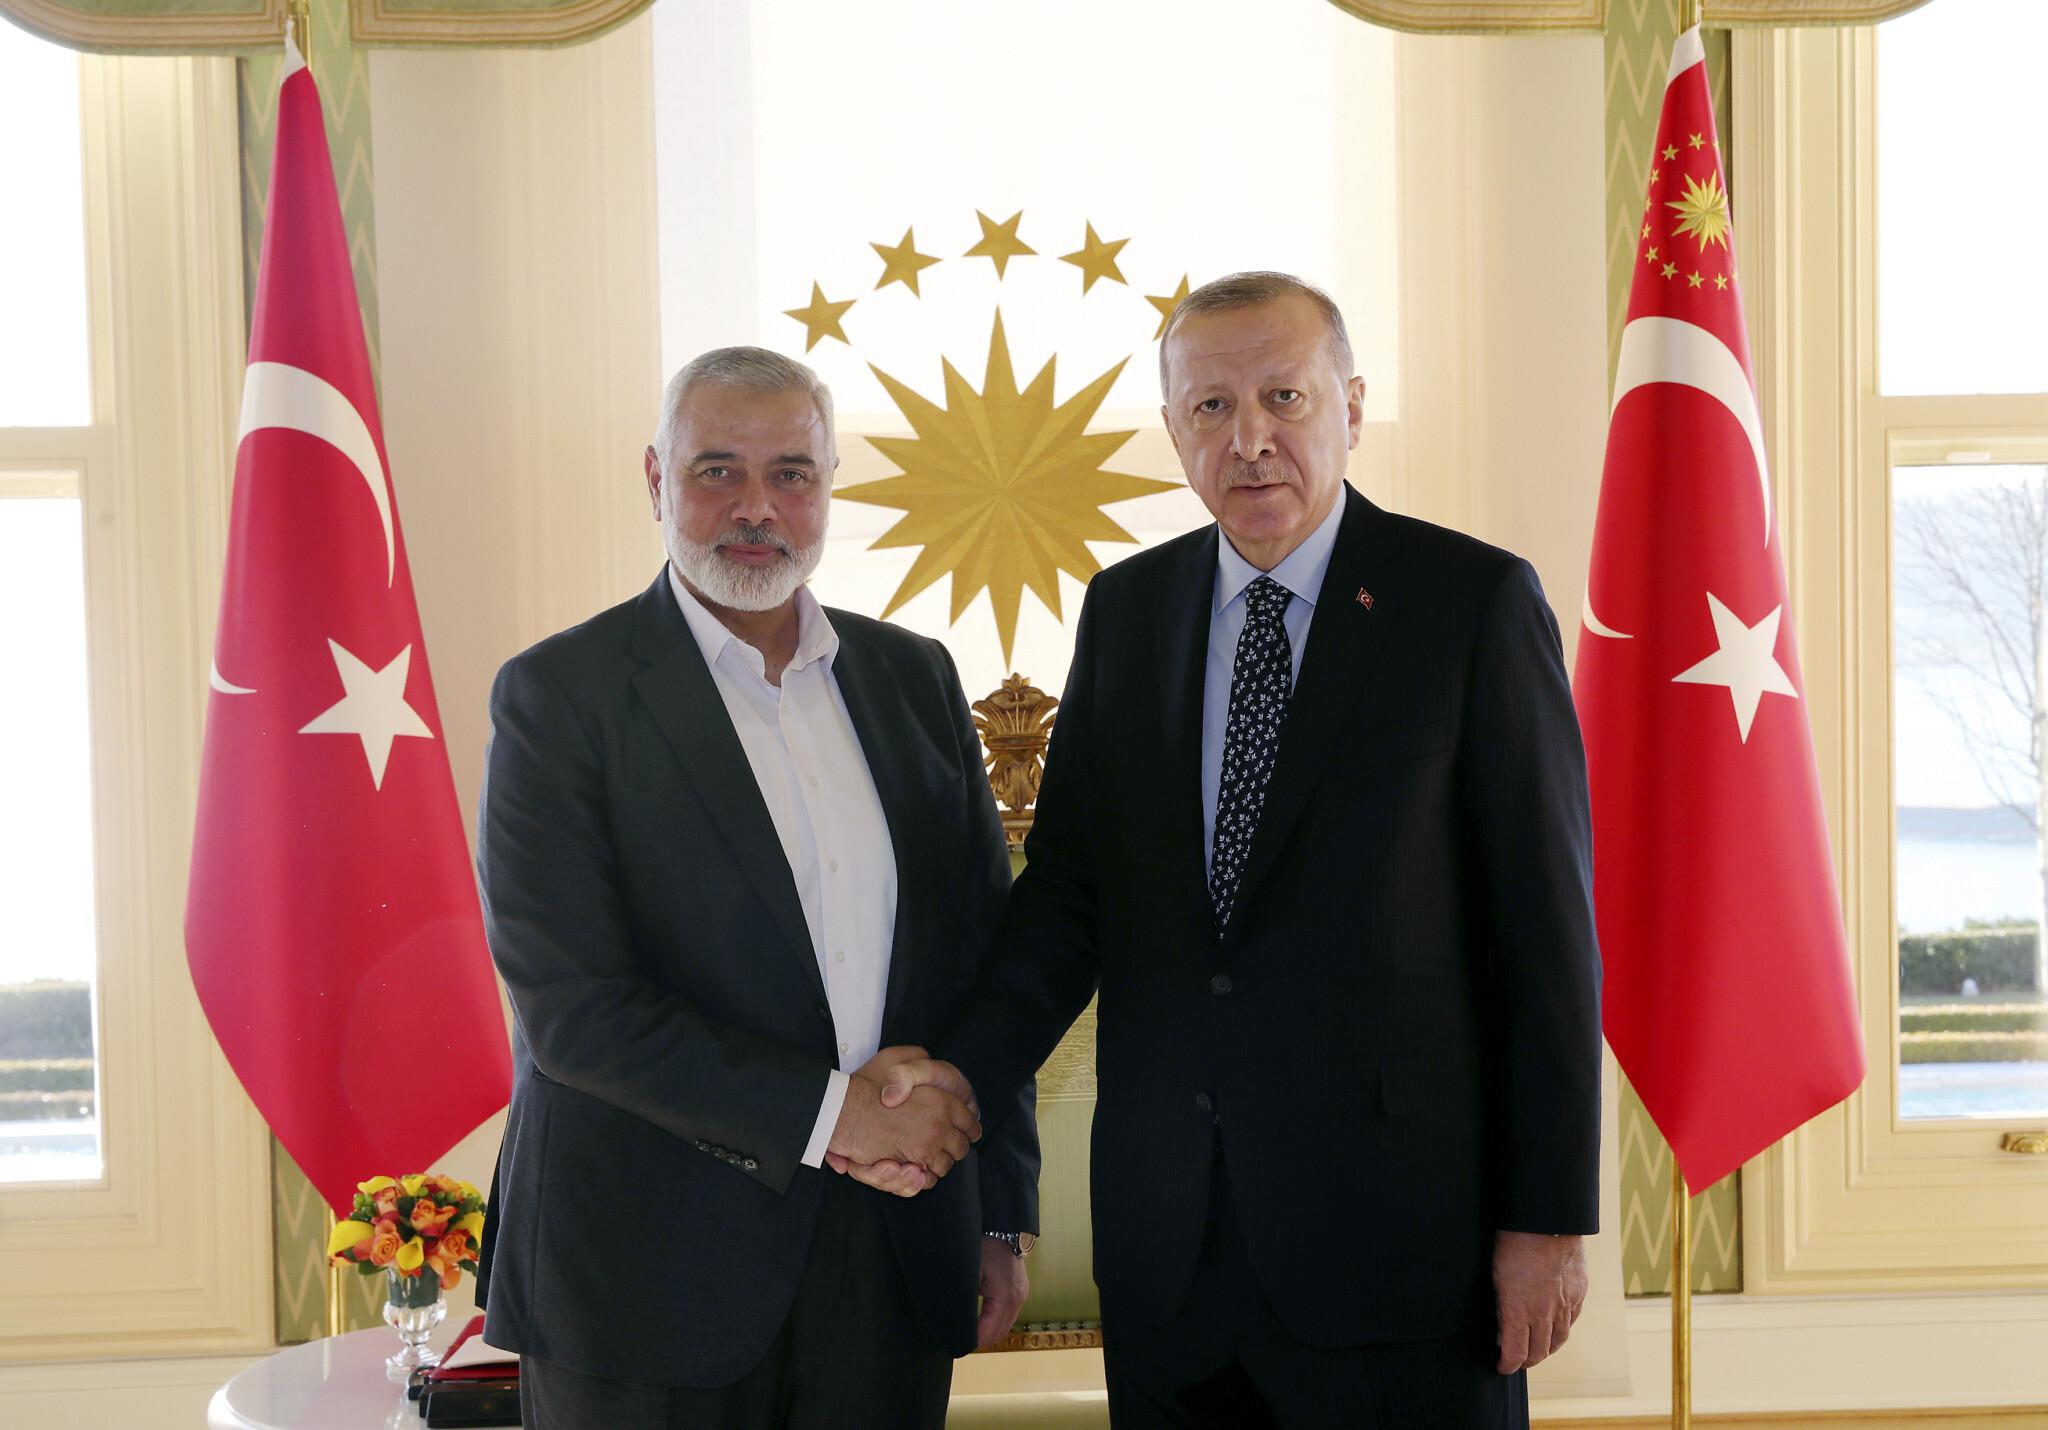 Turkey gave citizenship to Hamas members planning terror attacks